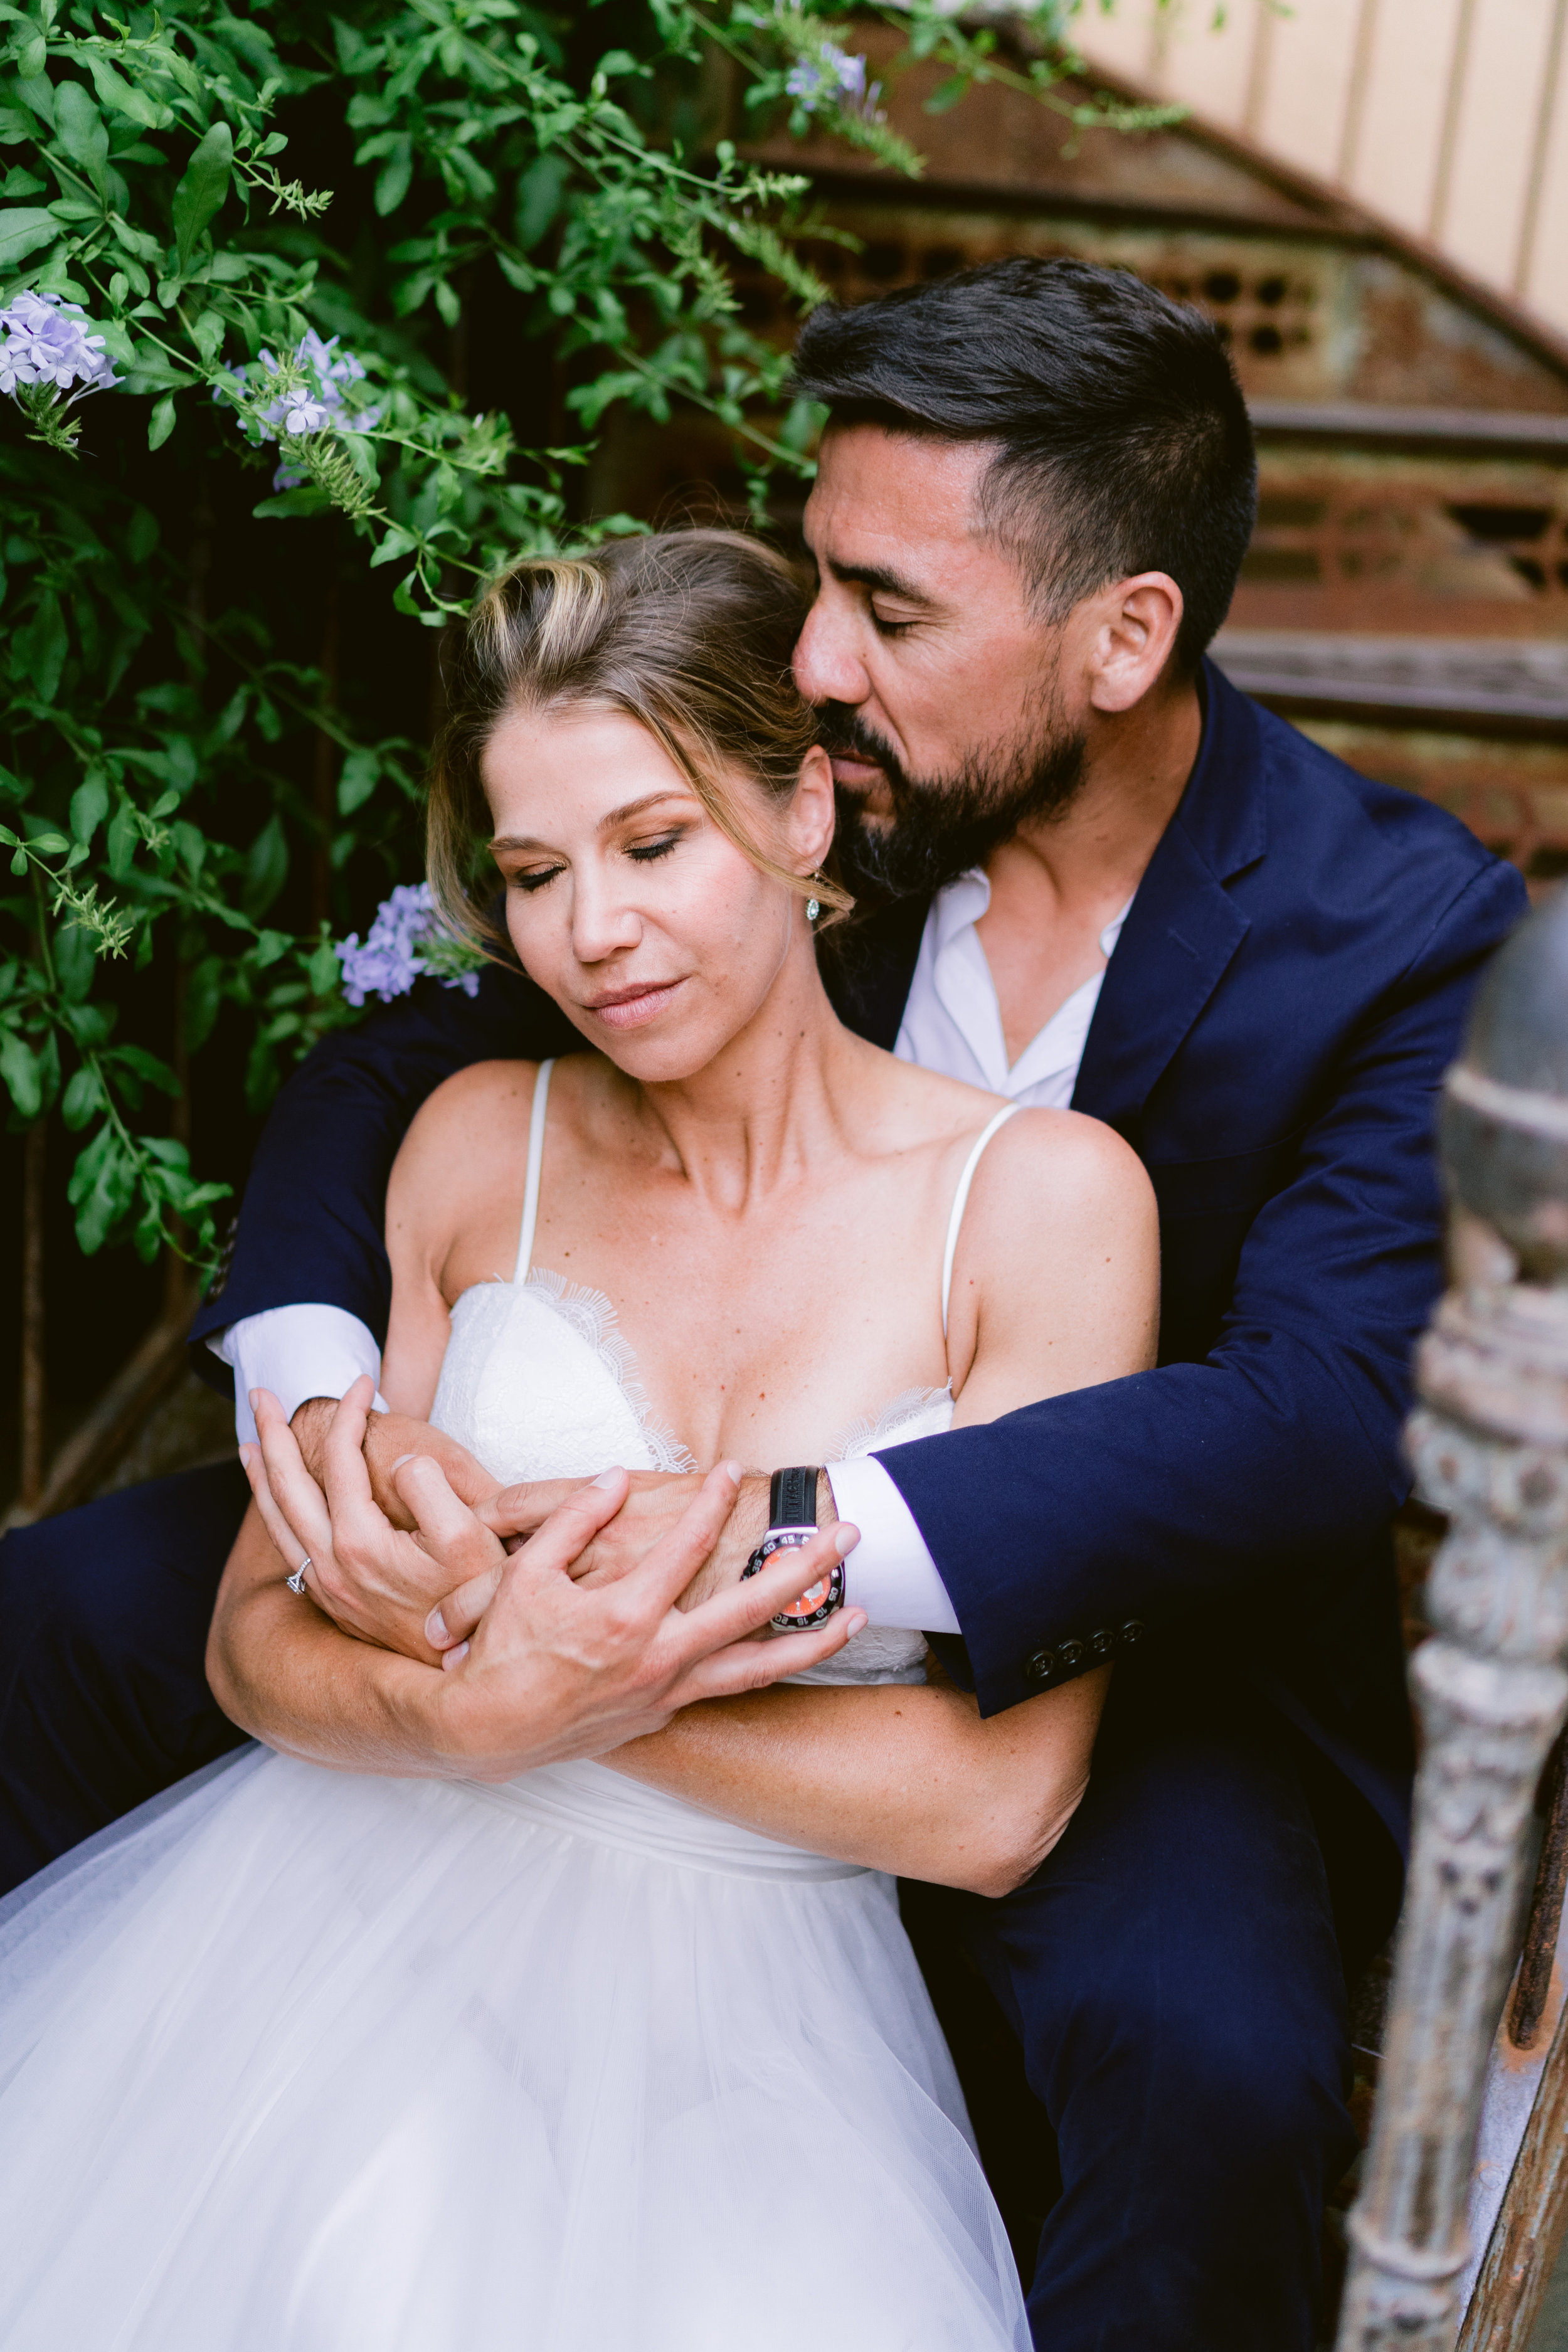 english photographer in france, wedding photographer saint tropez, romantic wedding photography france, chateau wedding france, cote d'azur wedding photographer, ramatuelle wedding (16).jpg